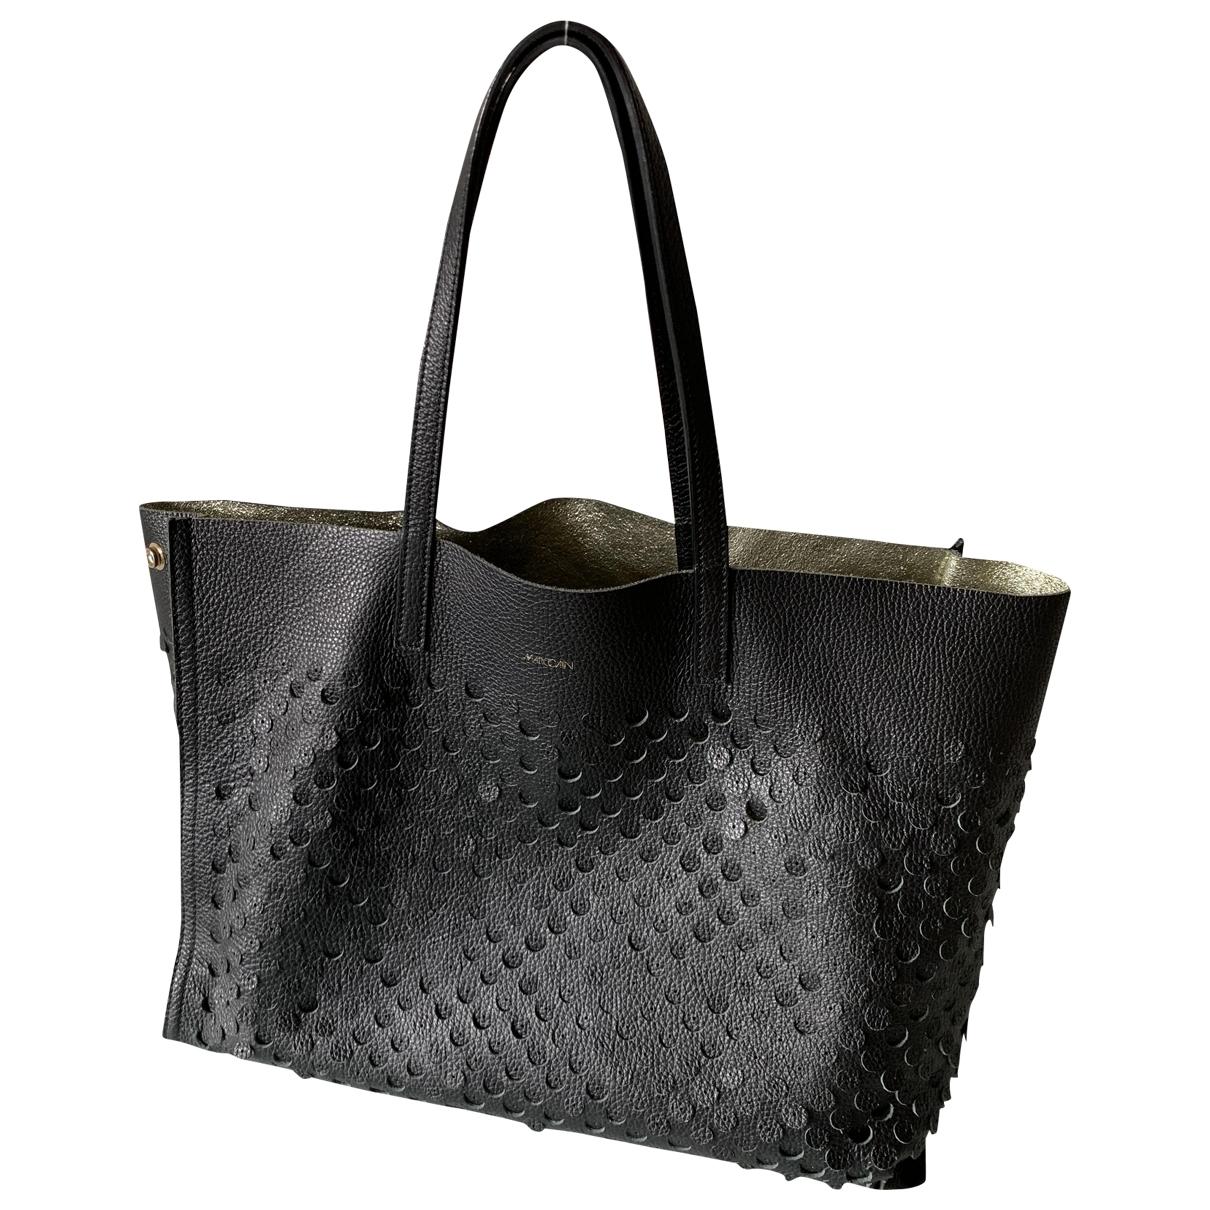 Marc Cain \N Black Leather handbag for Women \N